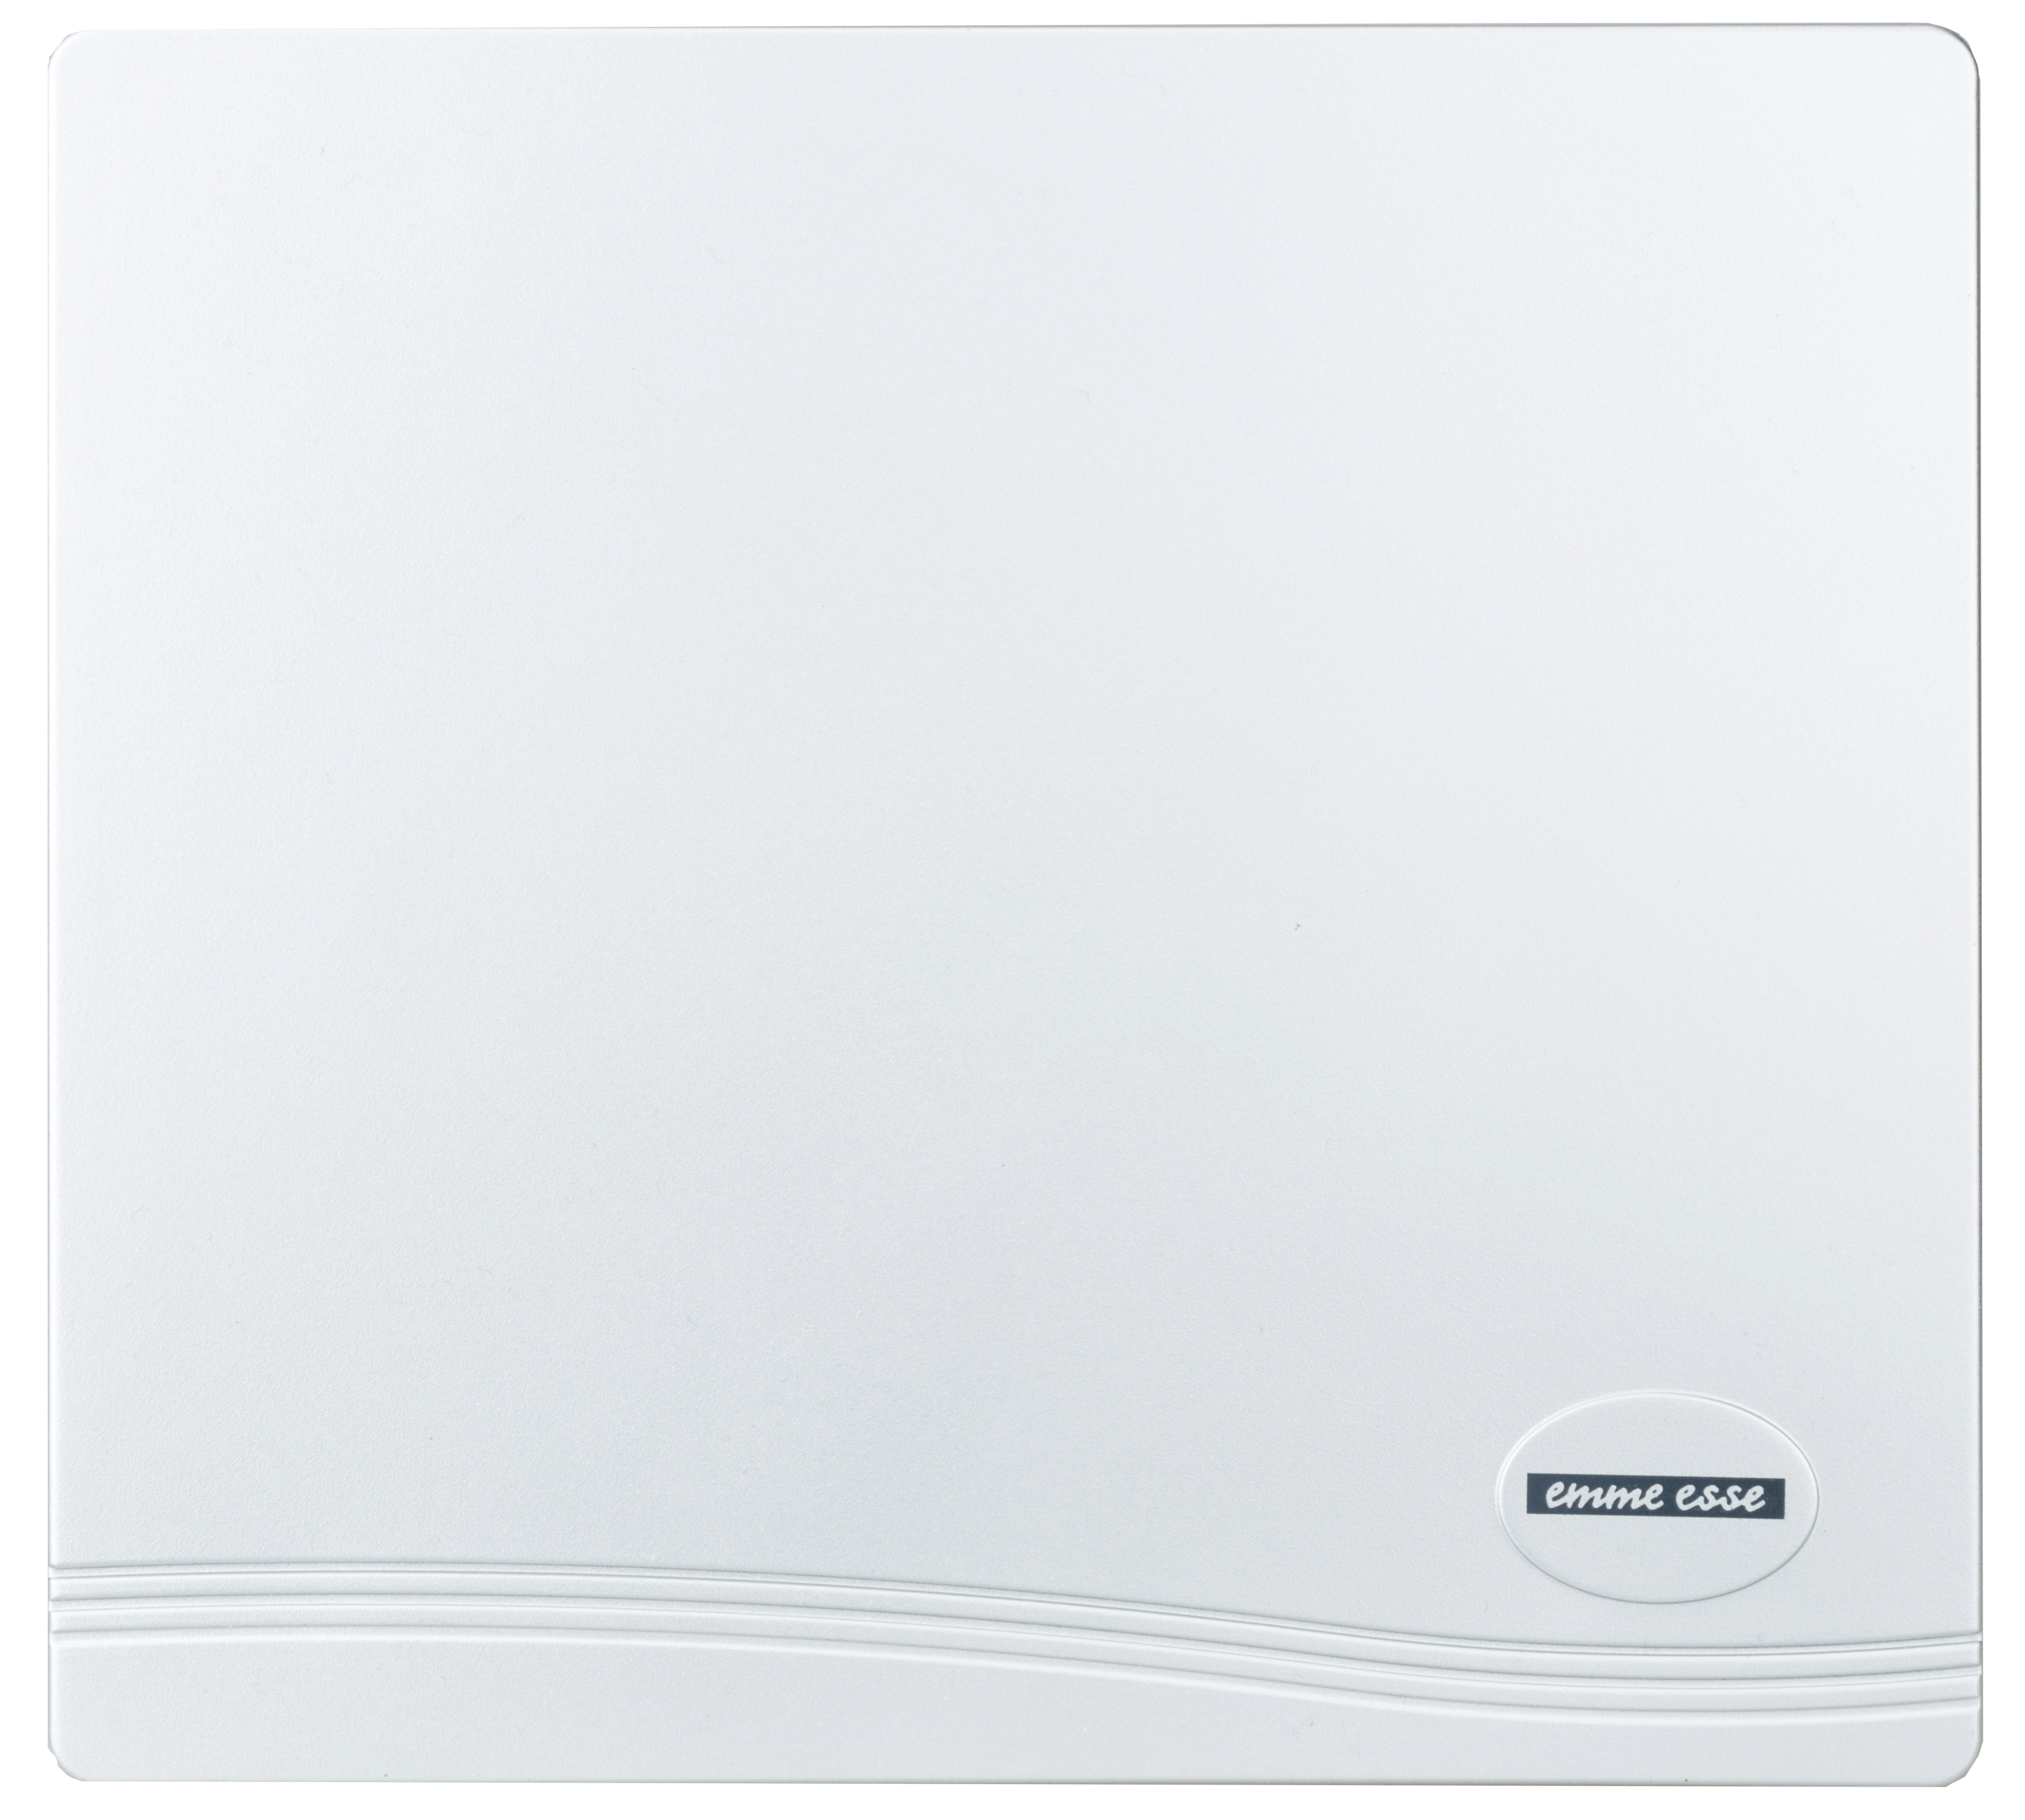 1 Stk DVB-T Antenne Innen, Flach, 220VAC/12VDC,inkl. Netzteil,Grau HSATATTI01